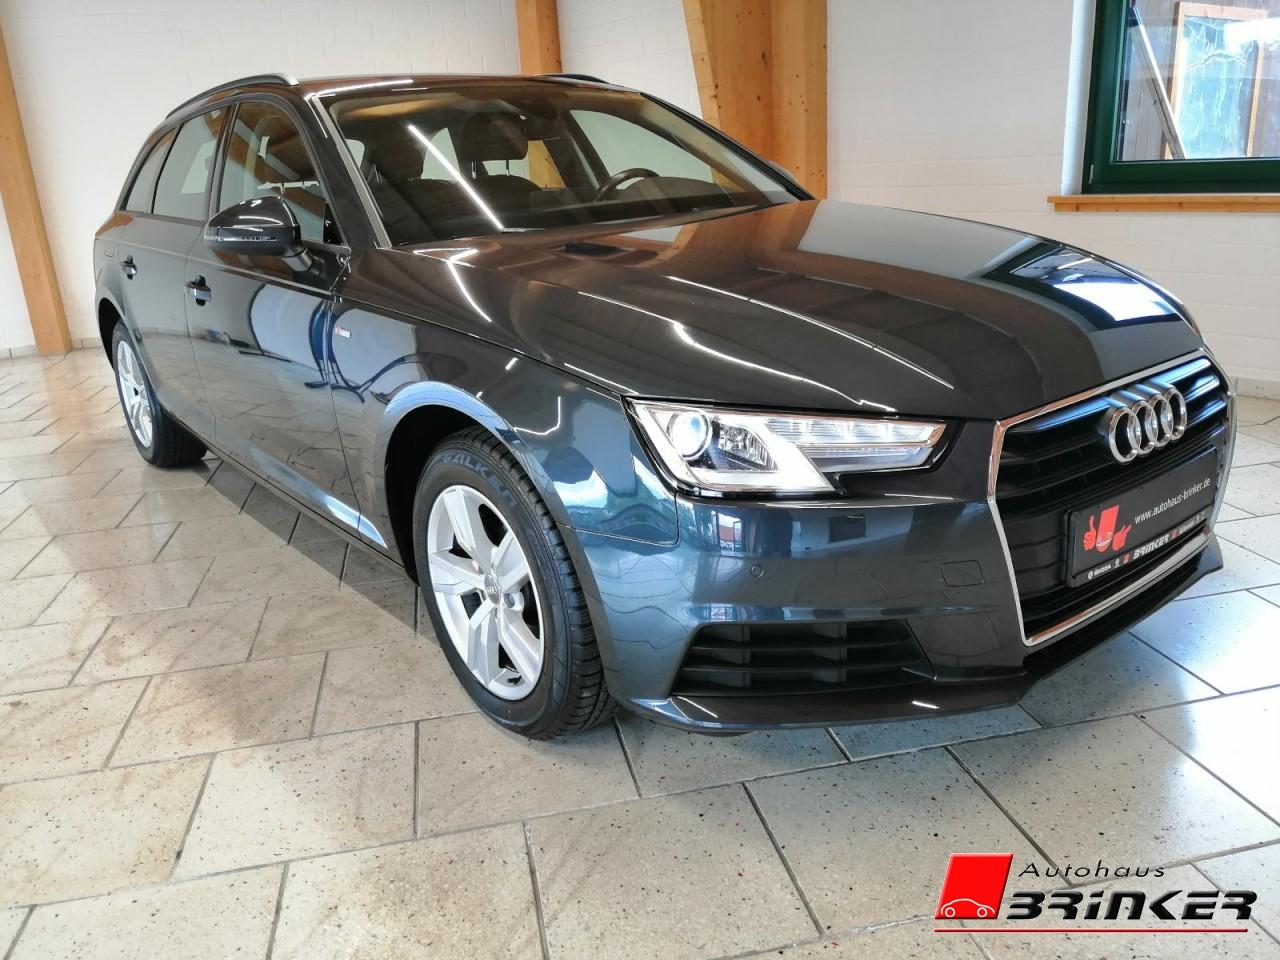 Audi A4 Avant 1,4 TFSI S-tronic Navi, Xenon, GRA, FiS, PDC, Jahr 2017, Benzin